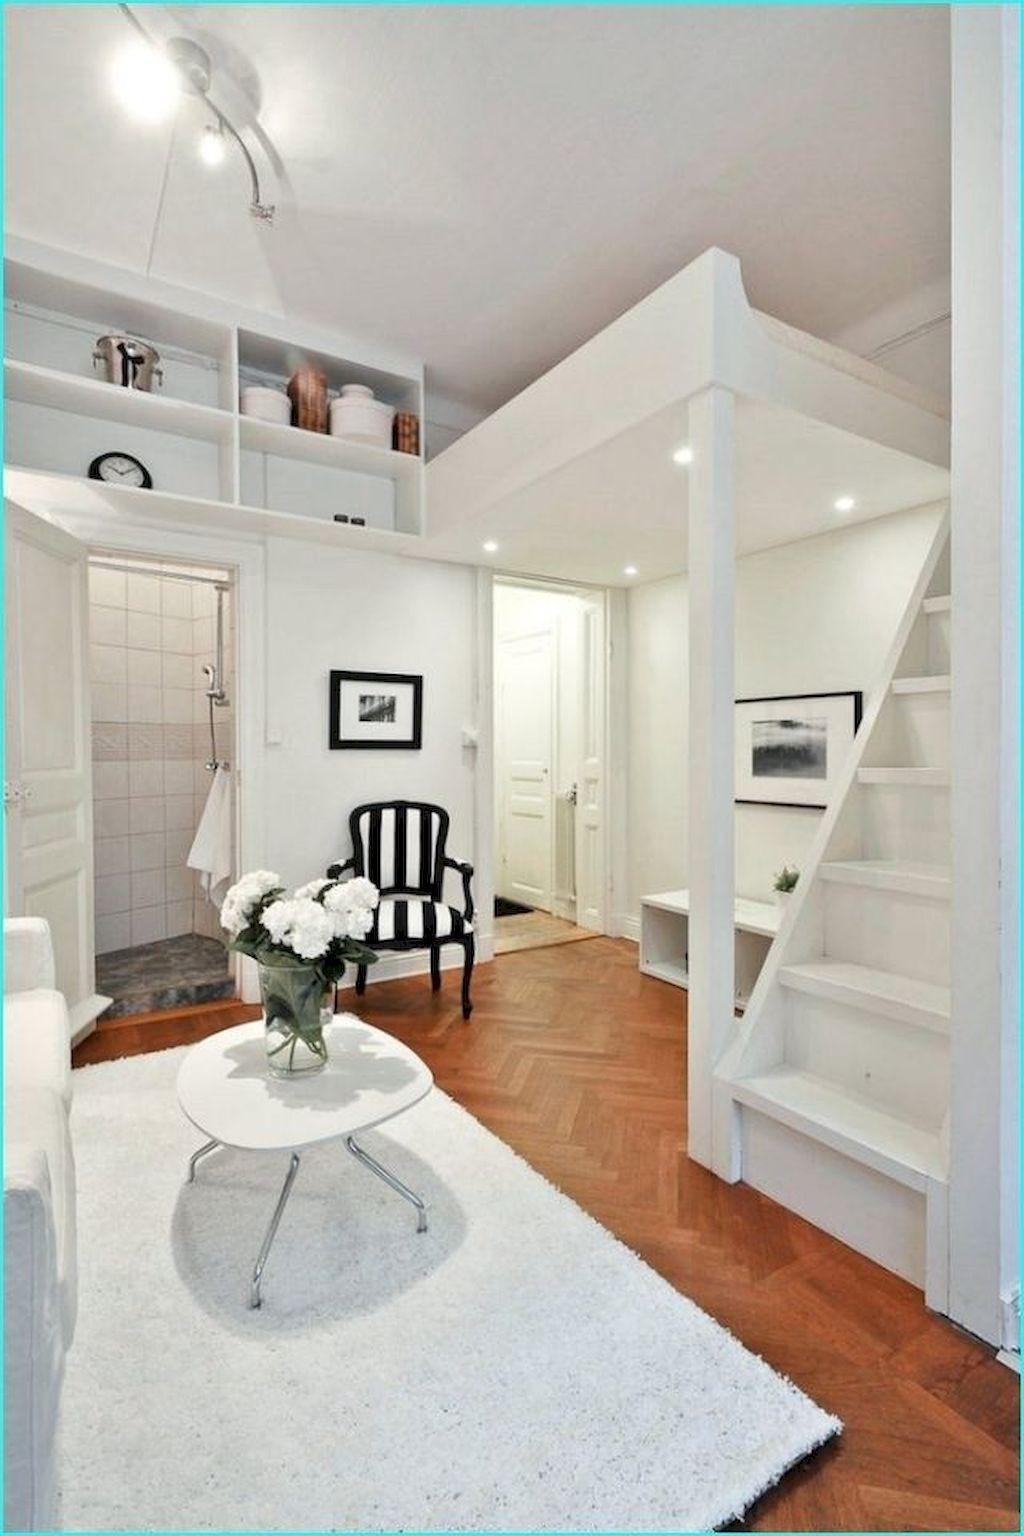 65 Clever Studio Apartment Decorating ideas Small studio